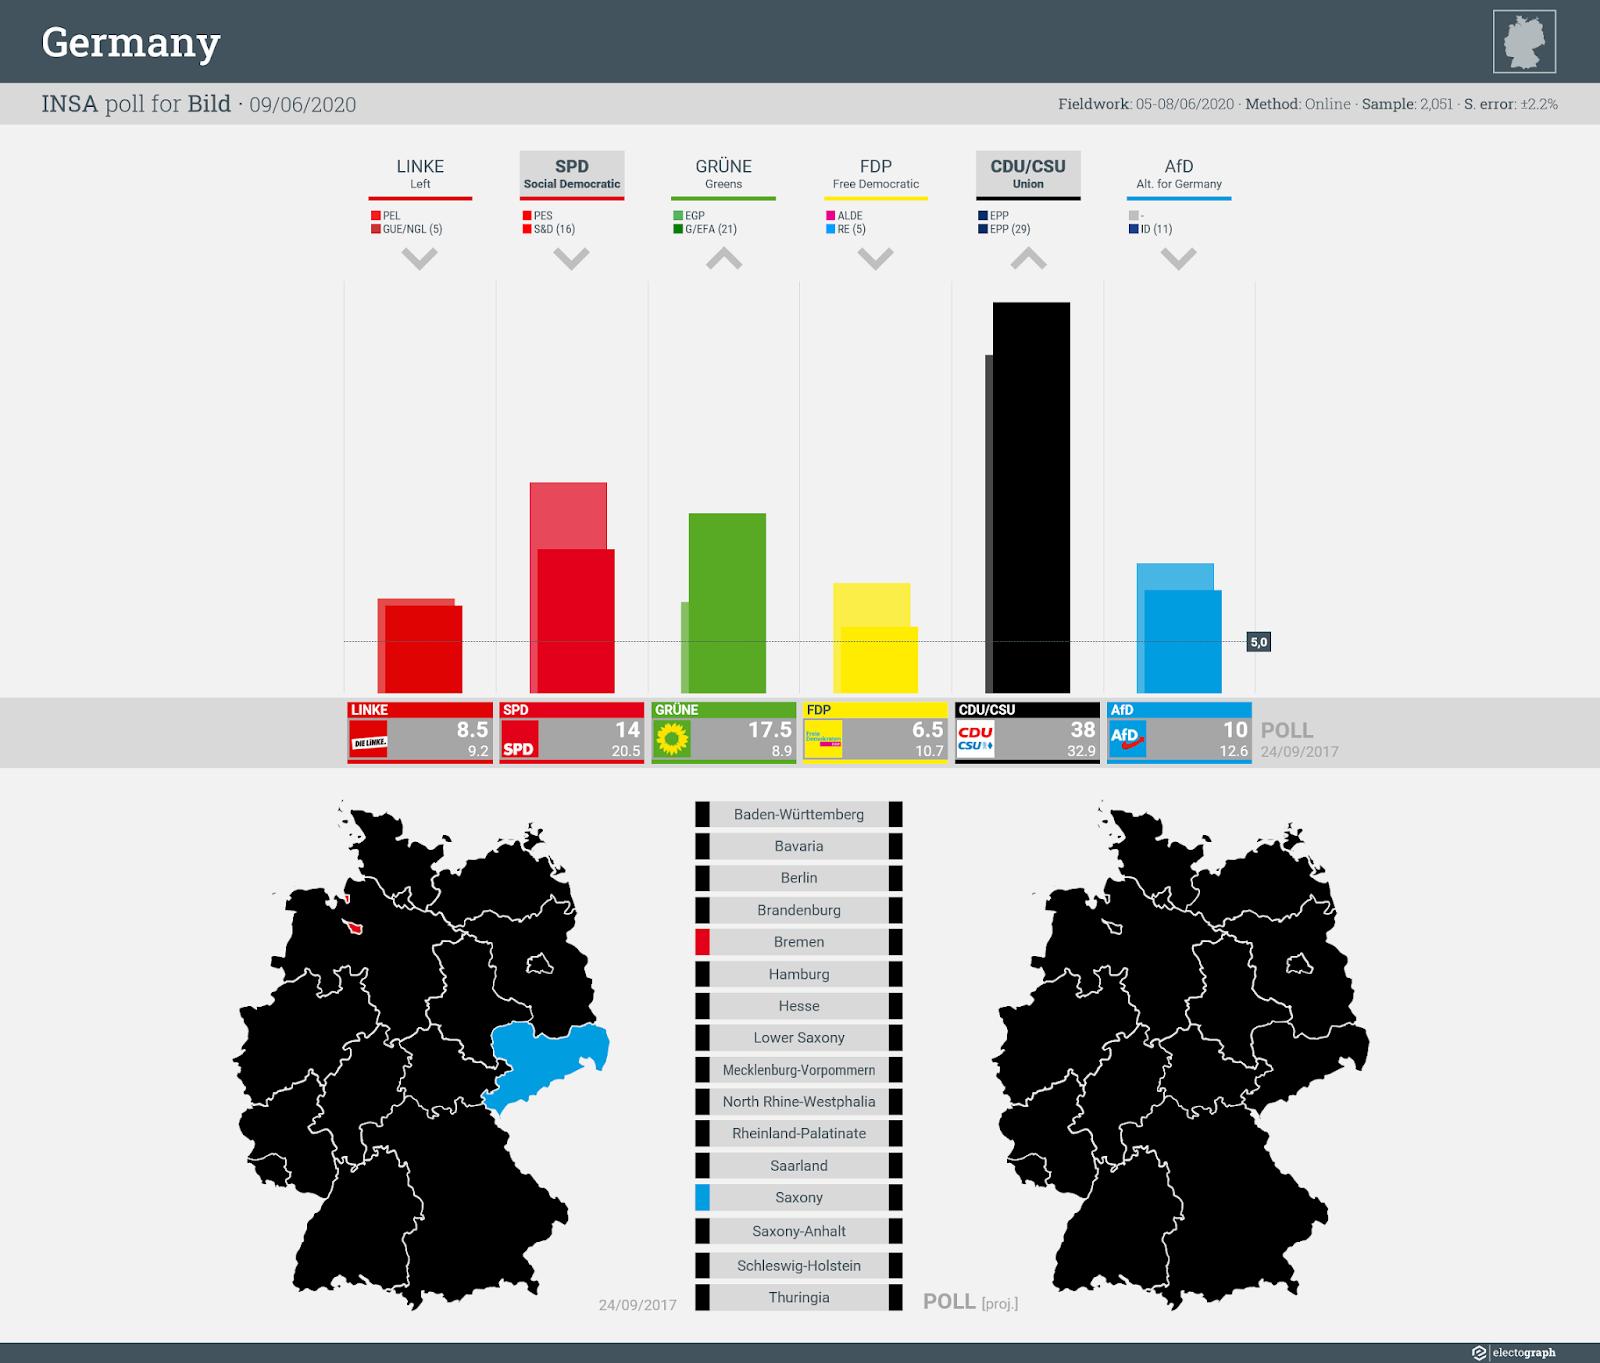 GERMANY: INSA poll chart for Bild, 9 June 2020